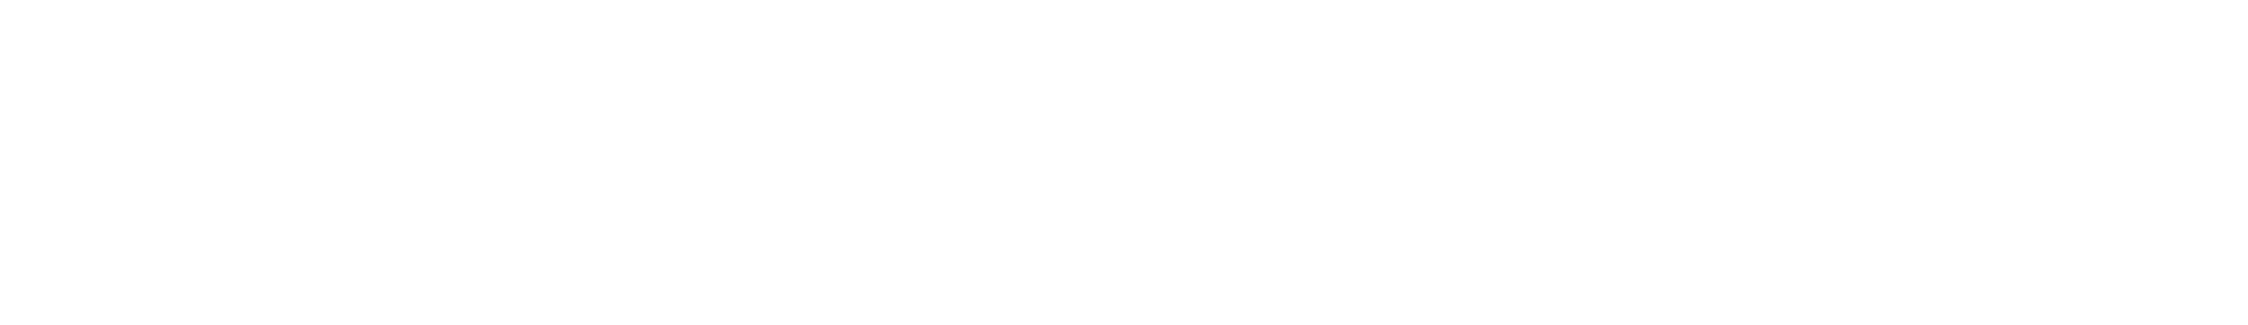 The Guyra Argus